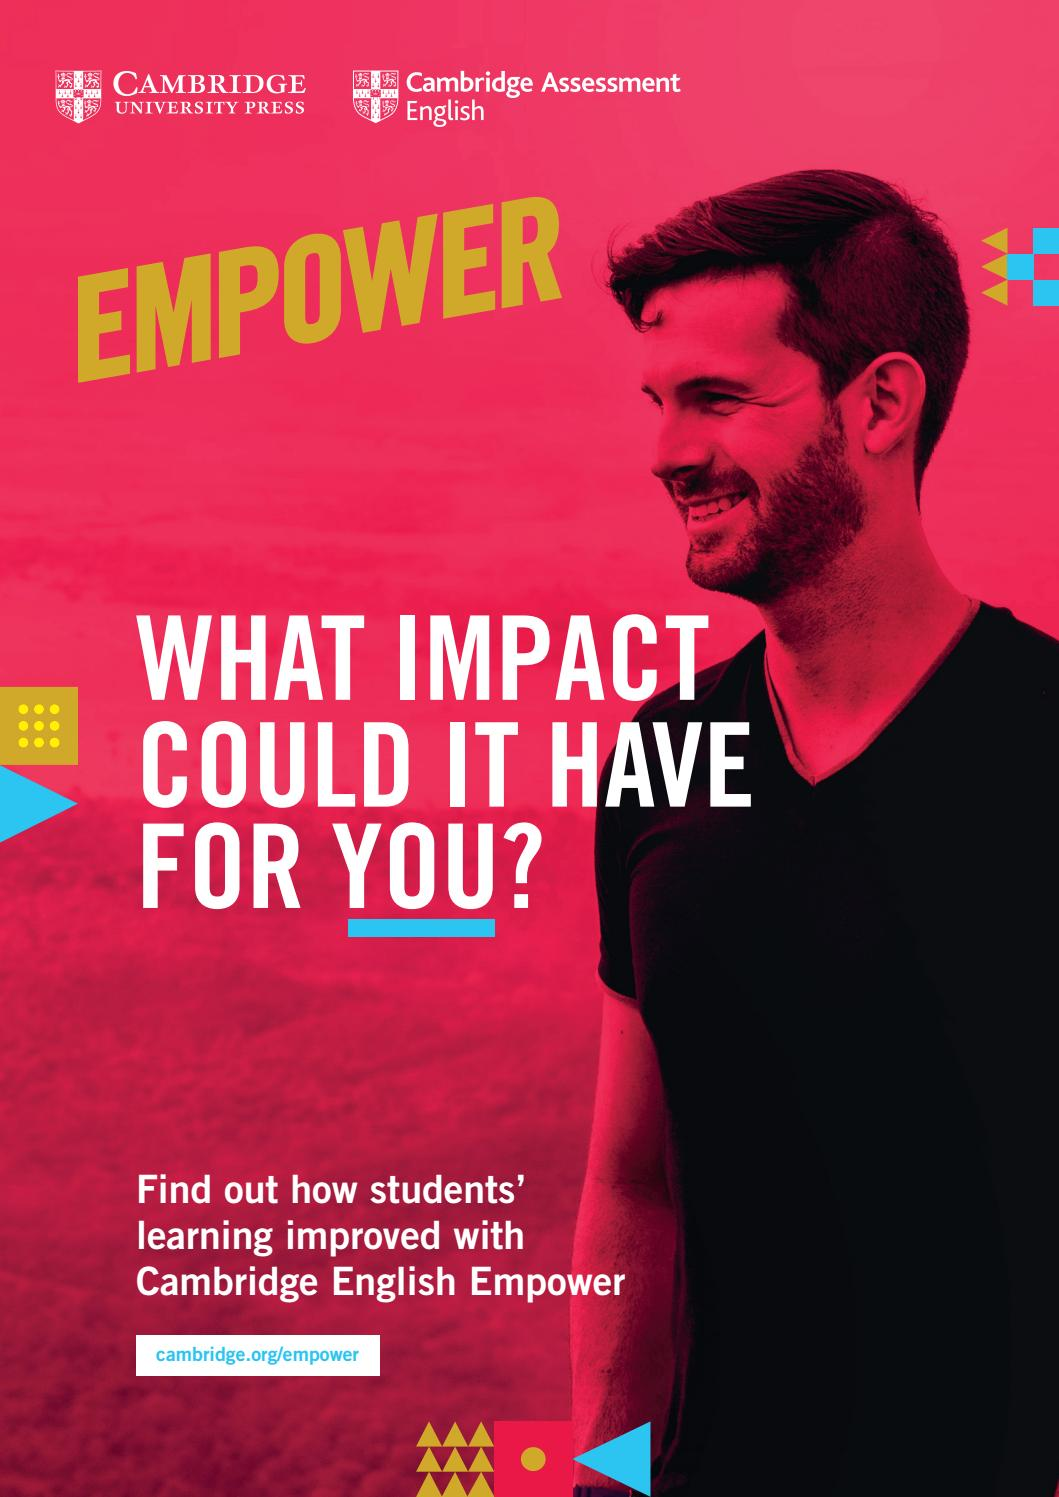 Cambridge English Empower by Cambridge University Press - Europe - issuu